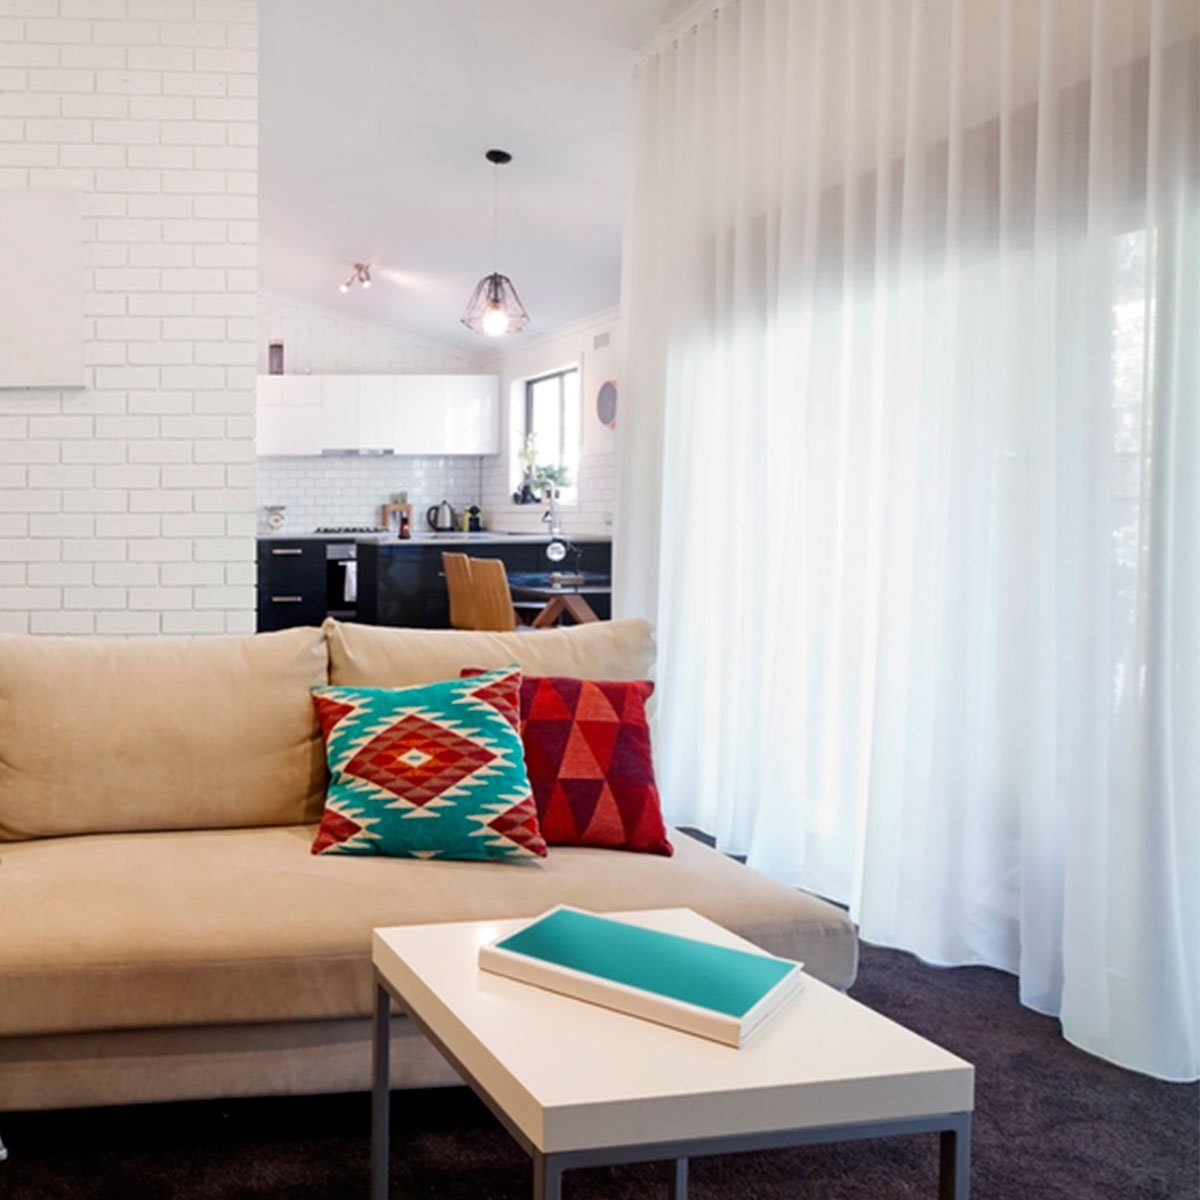 Small Room Ideas: Sheer Window Treatments